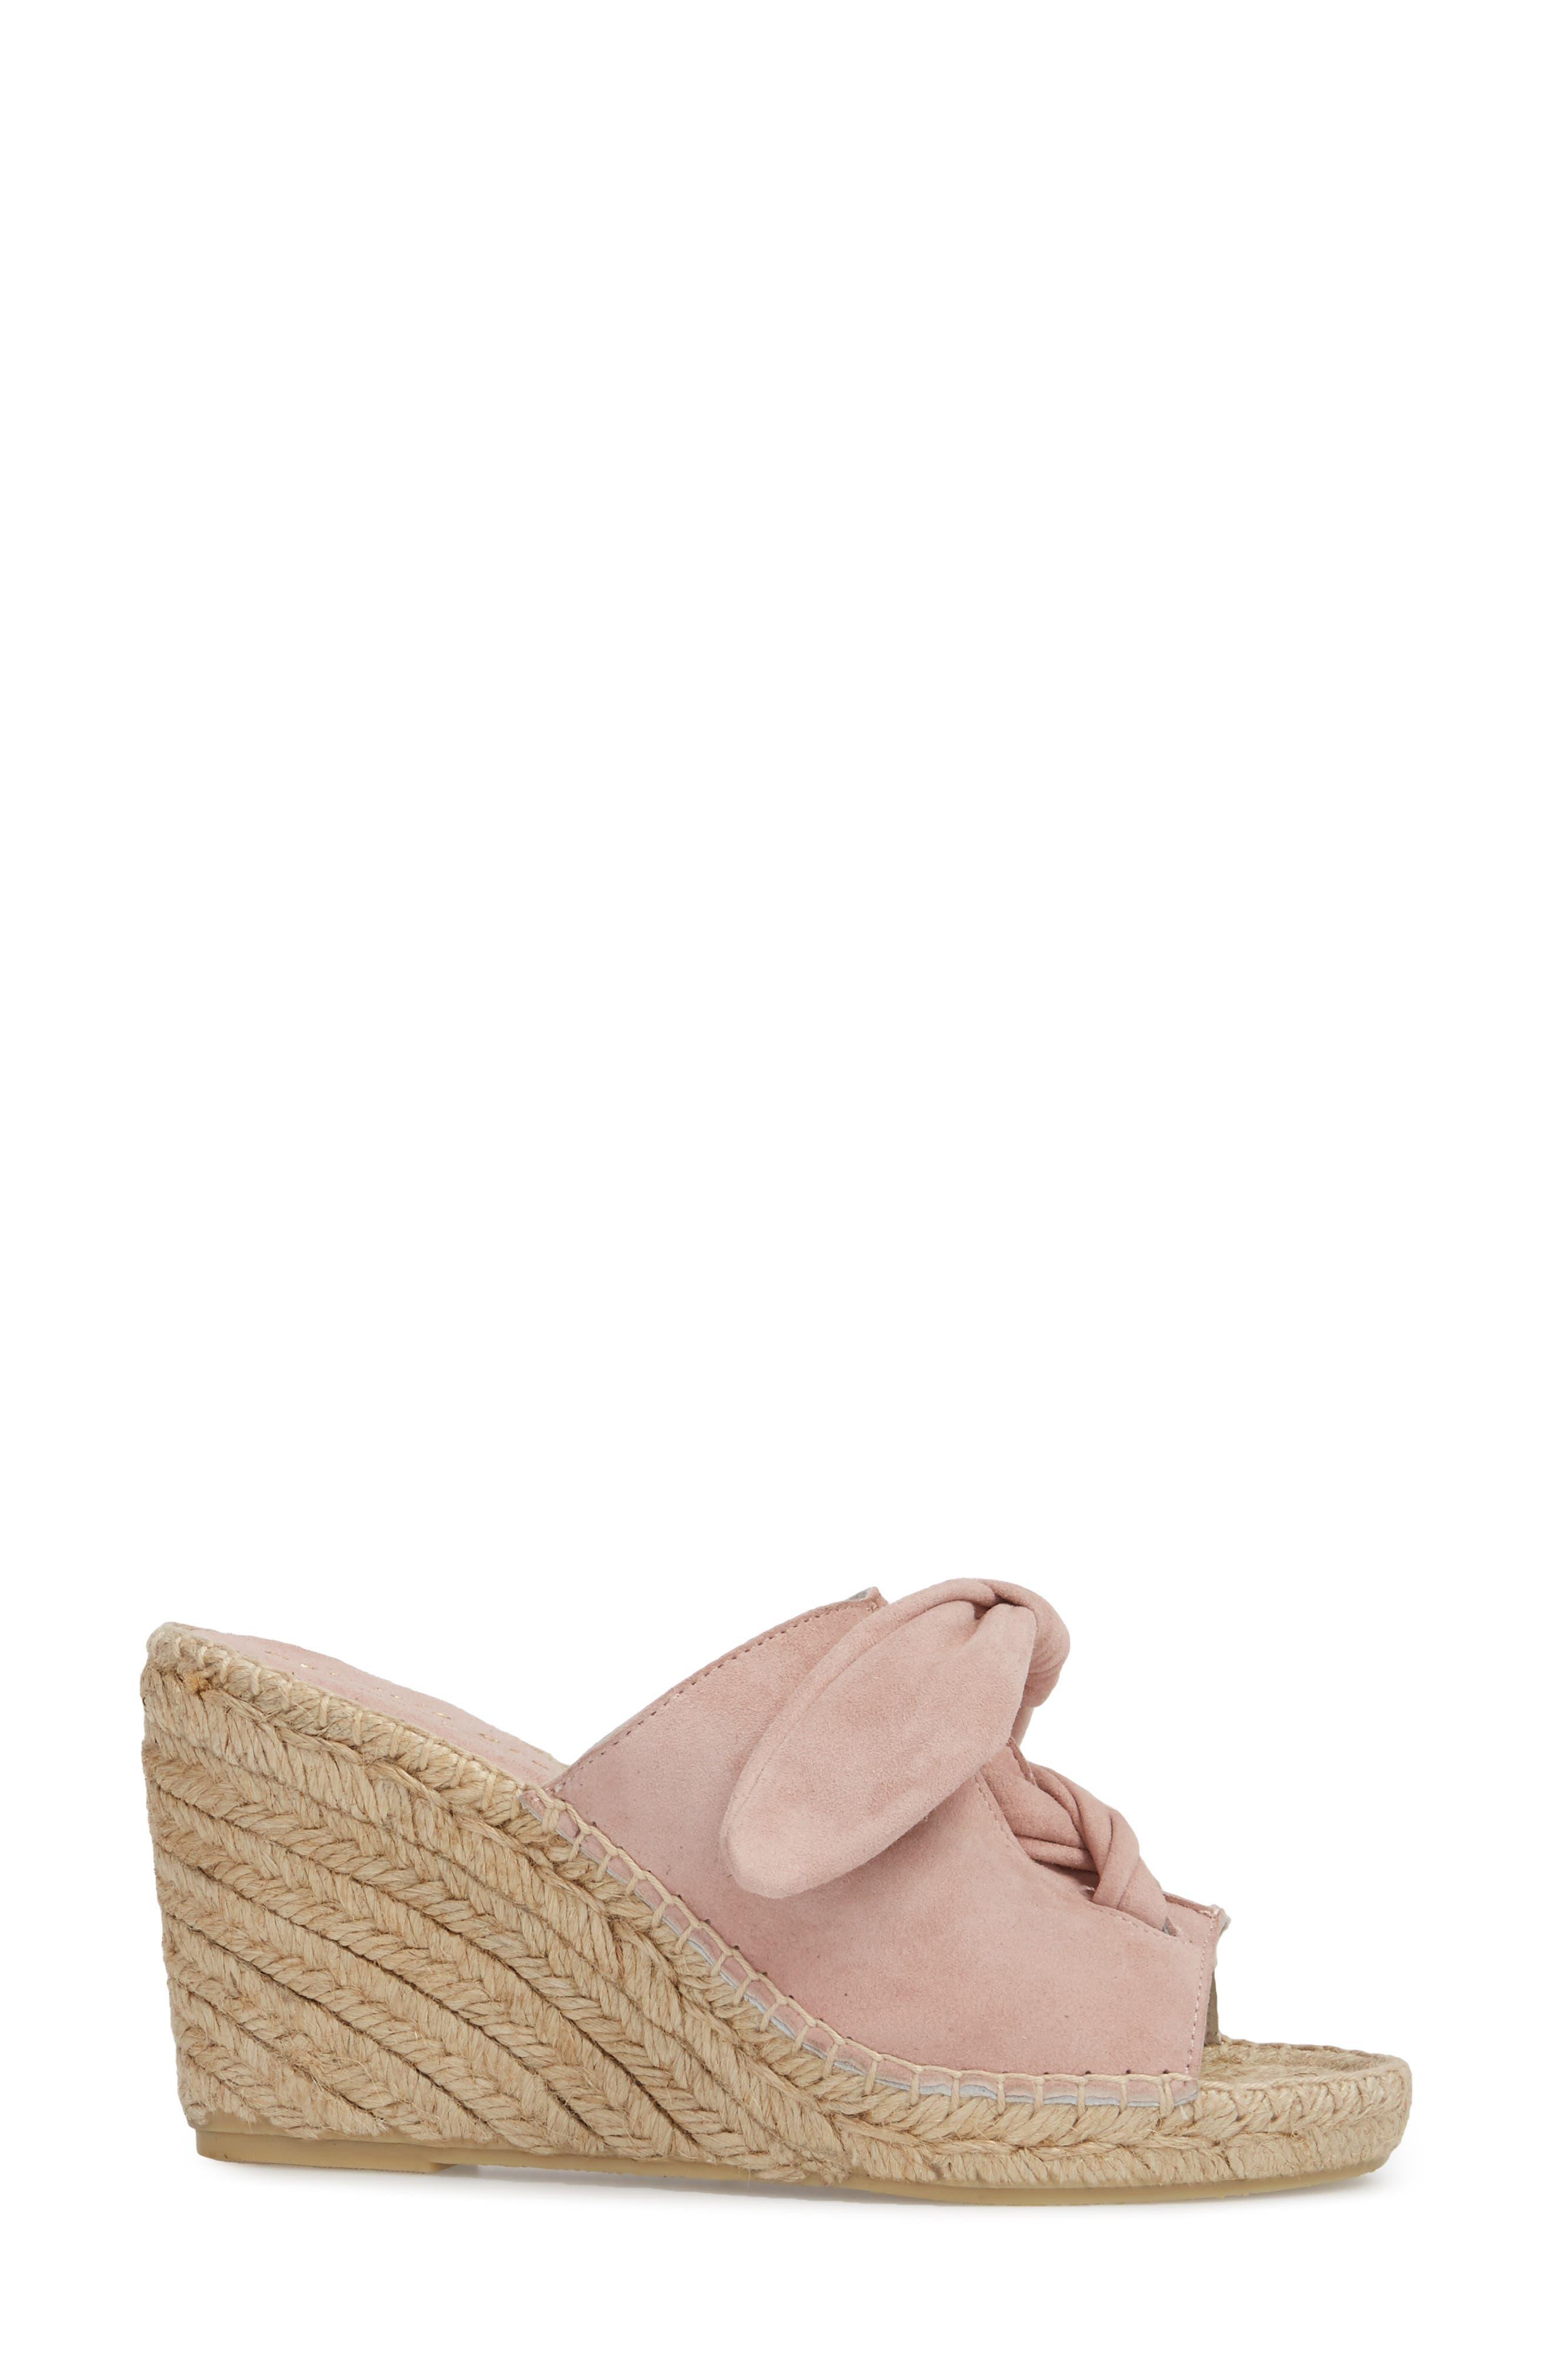 Flirt Espadrille Wedge Sandal,                             Alternate thumbnail 3, color,                             Pink Suede